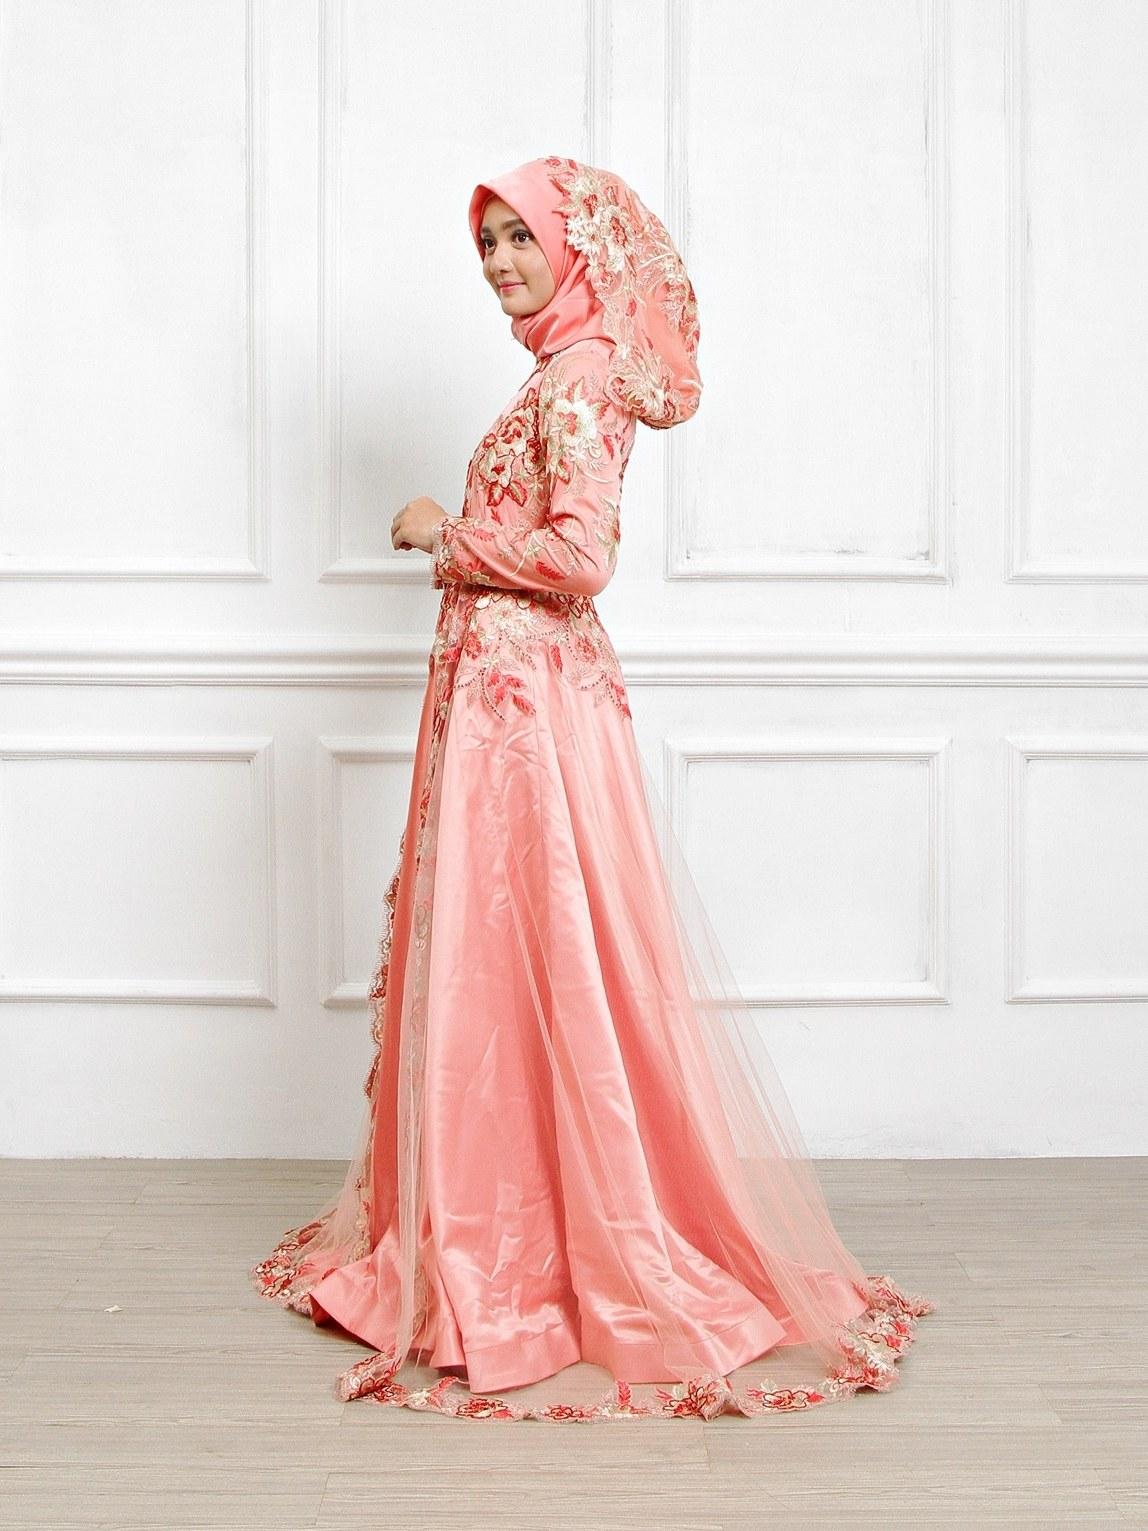 Design Sewa Baju Pengantin Muslimah Murah Nkde Sewa Perdana Baju Pengantin Muslimah Jogja Gaun Pengantin